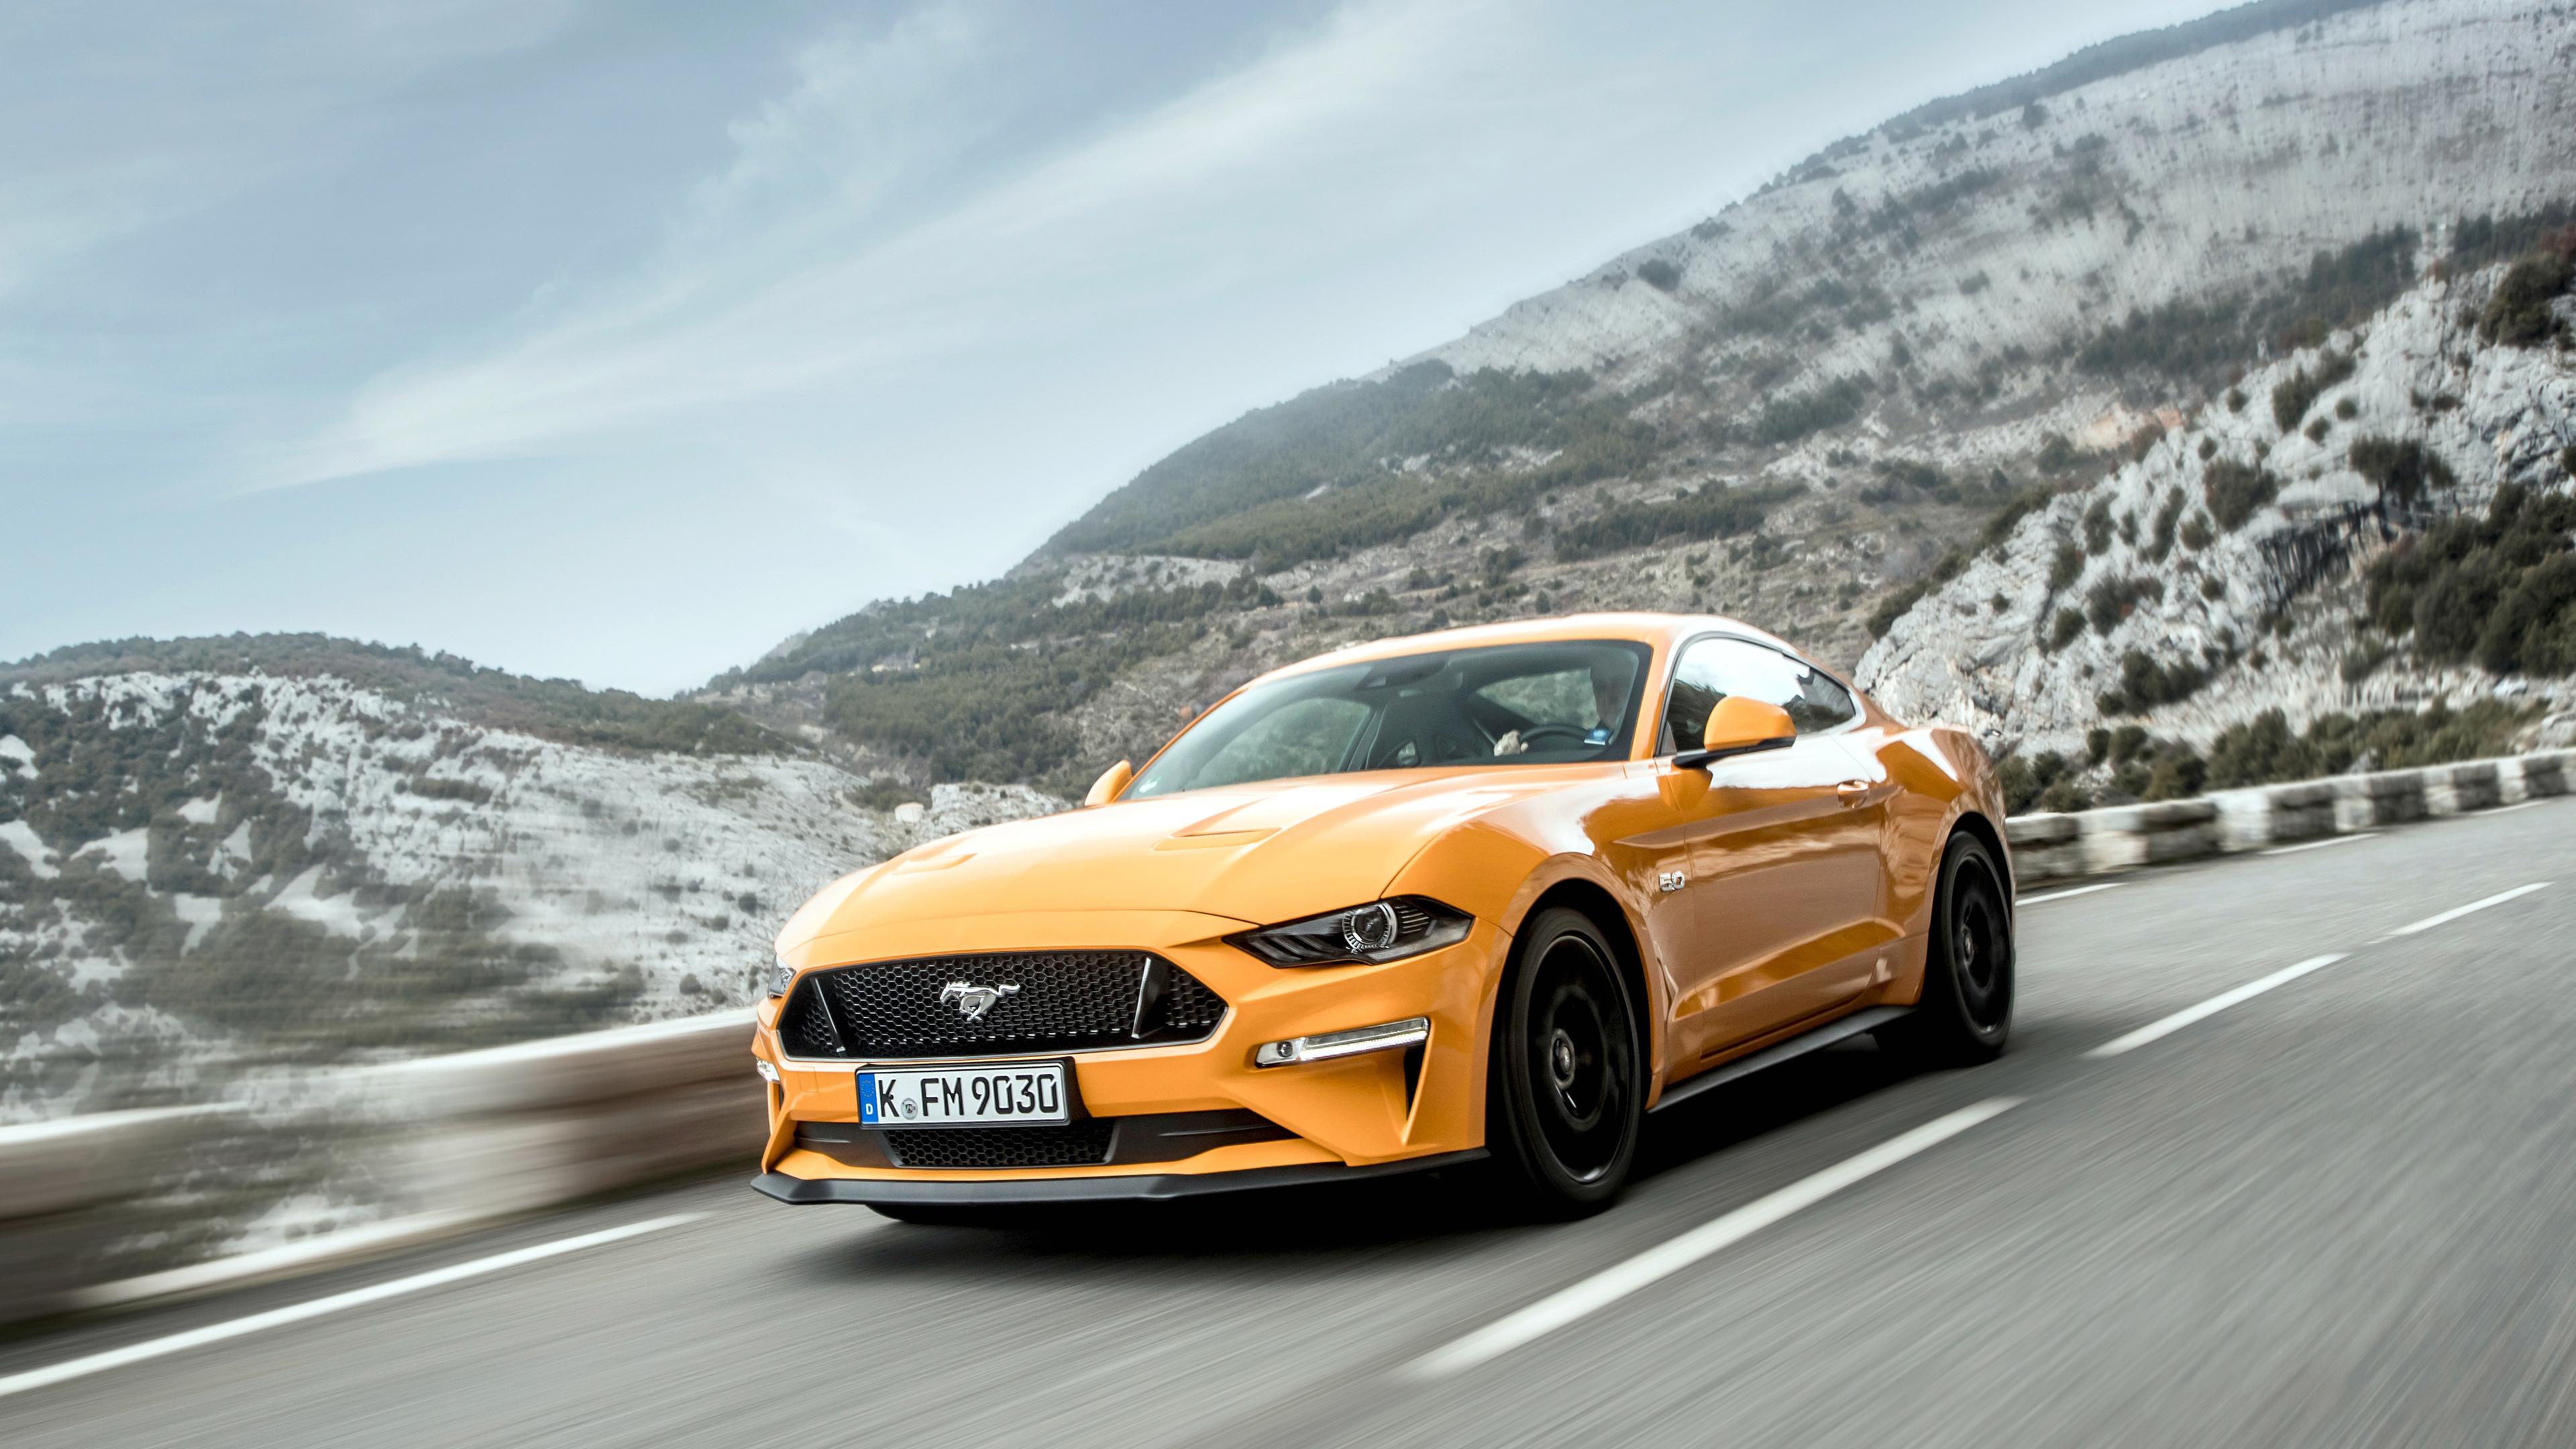 ford mustang gt fastback 1539110600 - Ford Mustang GT Fastback - mustang wallpapers, hd-wallpapers, ford mustang wallpapers, cars wallpapers, 4k-wallpapers, 2018 cars wallpapers